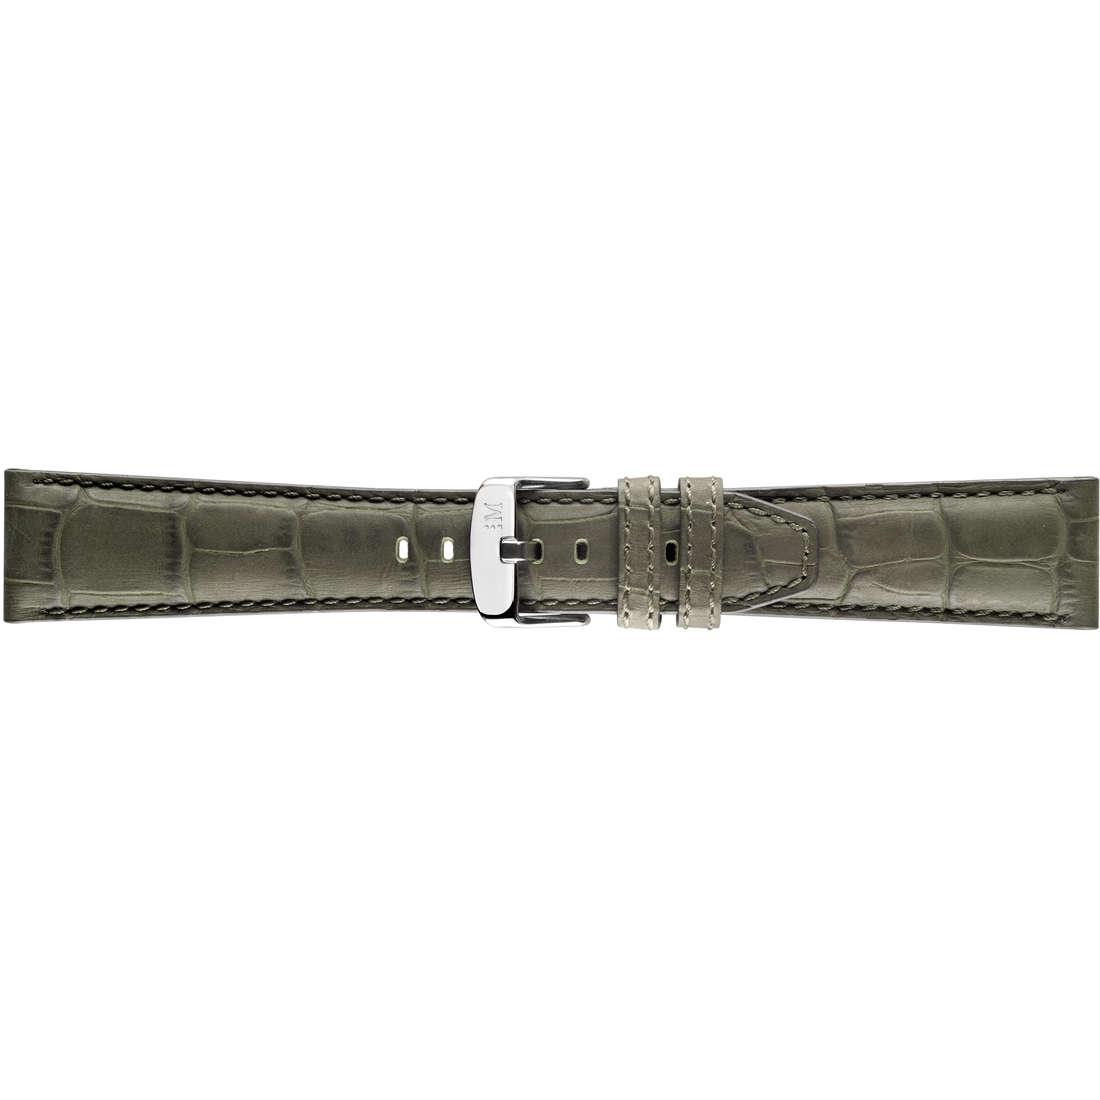 watch watch bands watch straps man Morellato Linea Sport A01X4497B44073CR20